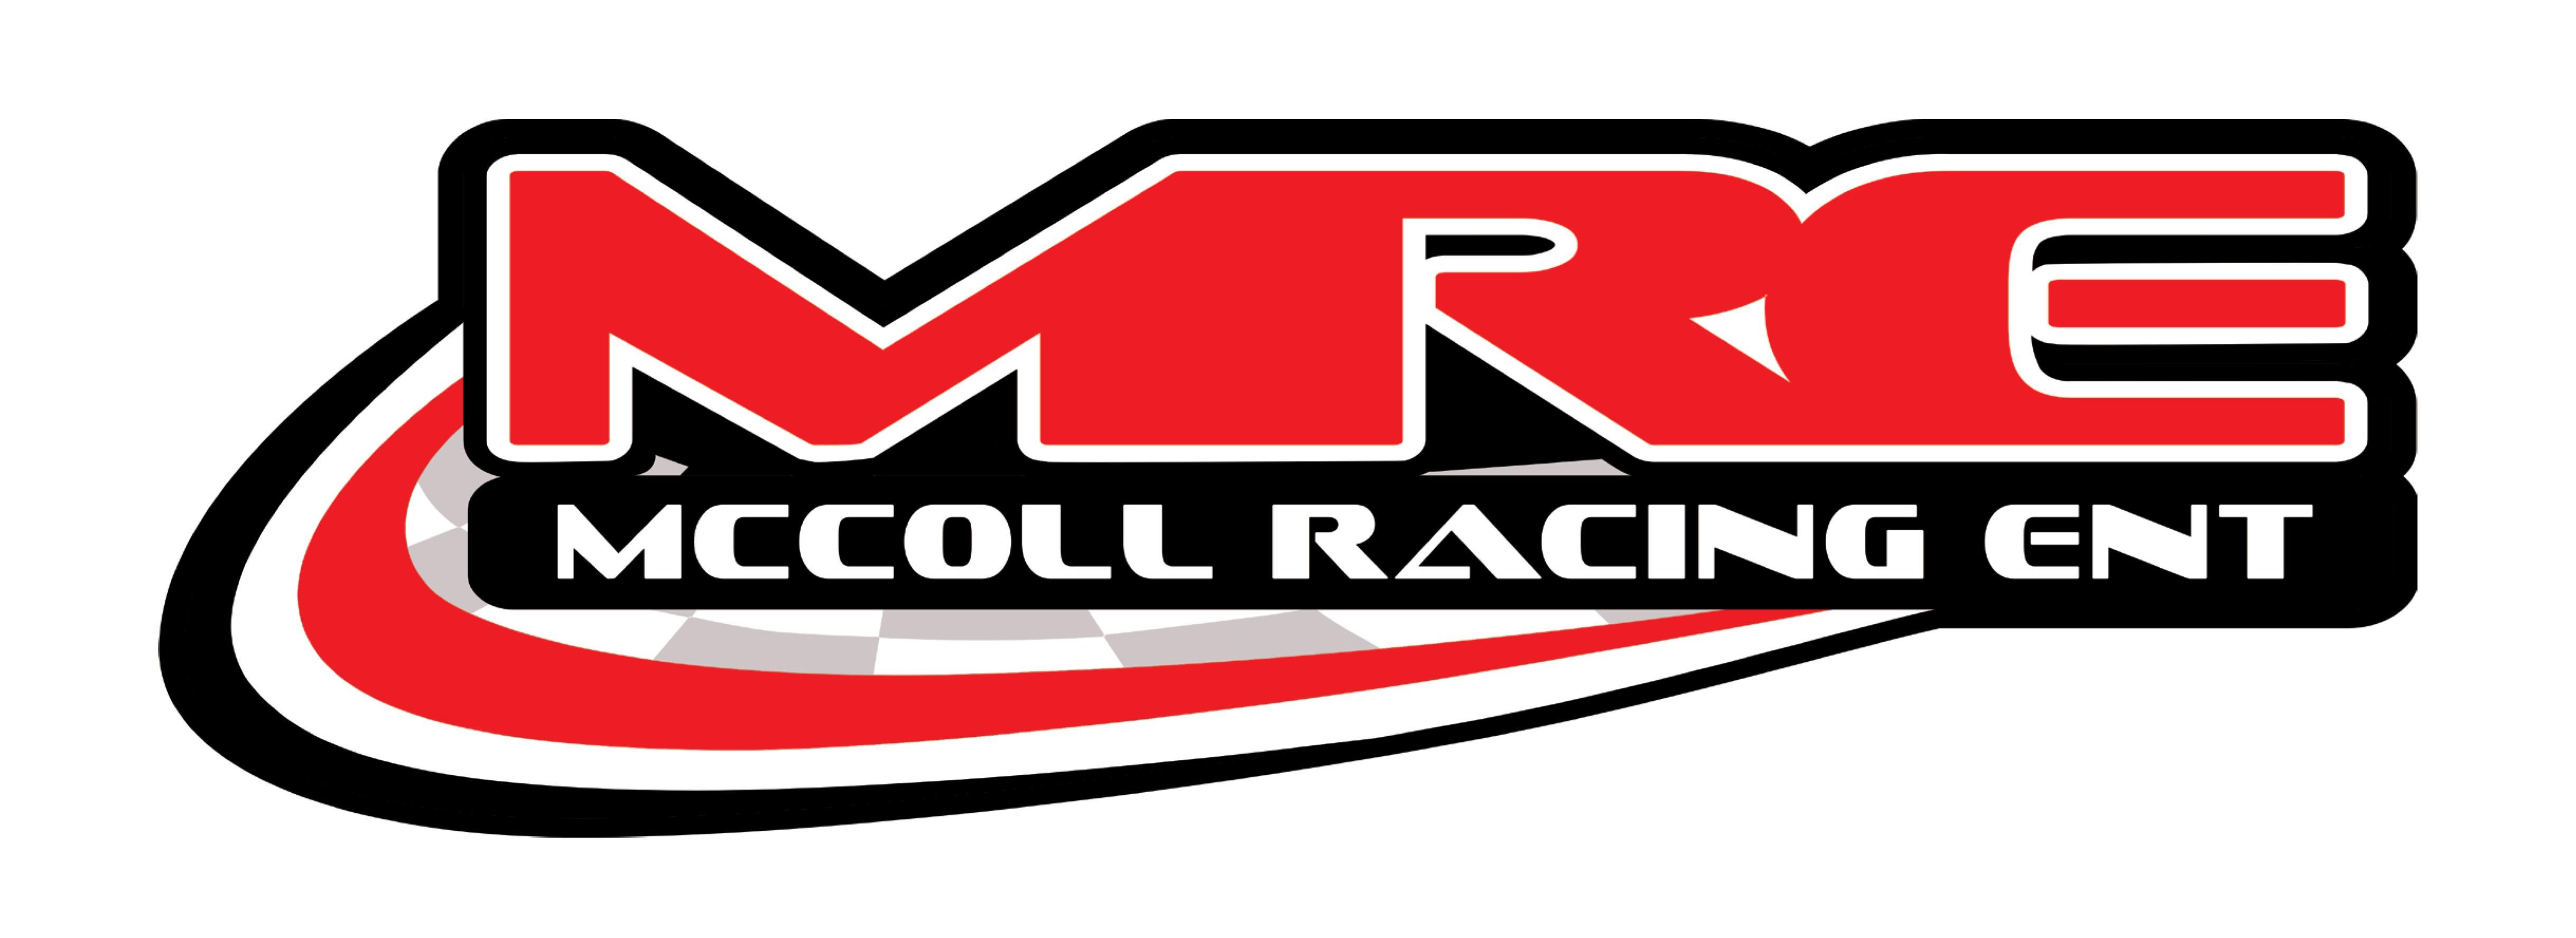 McColl Racing